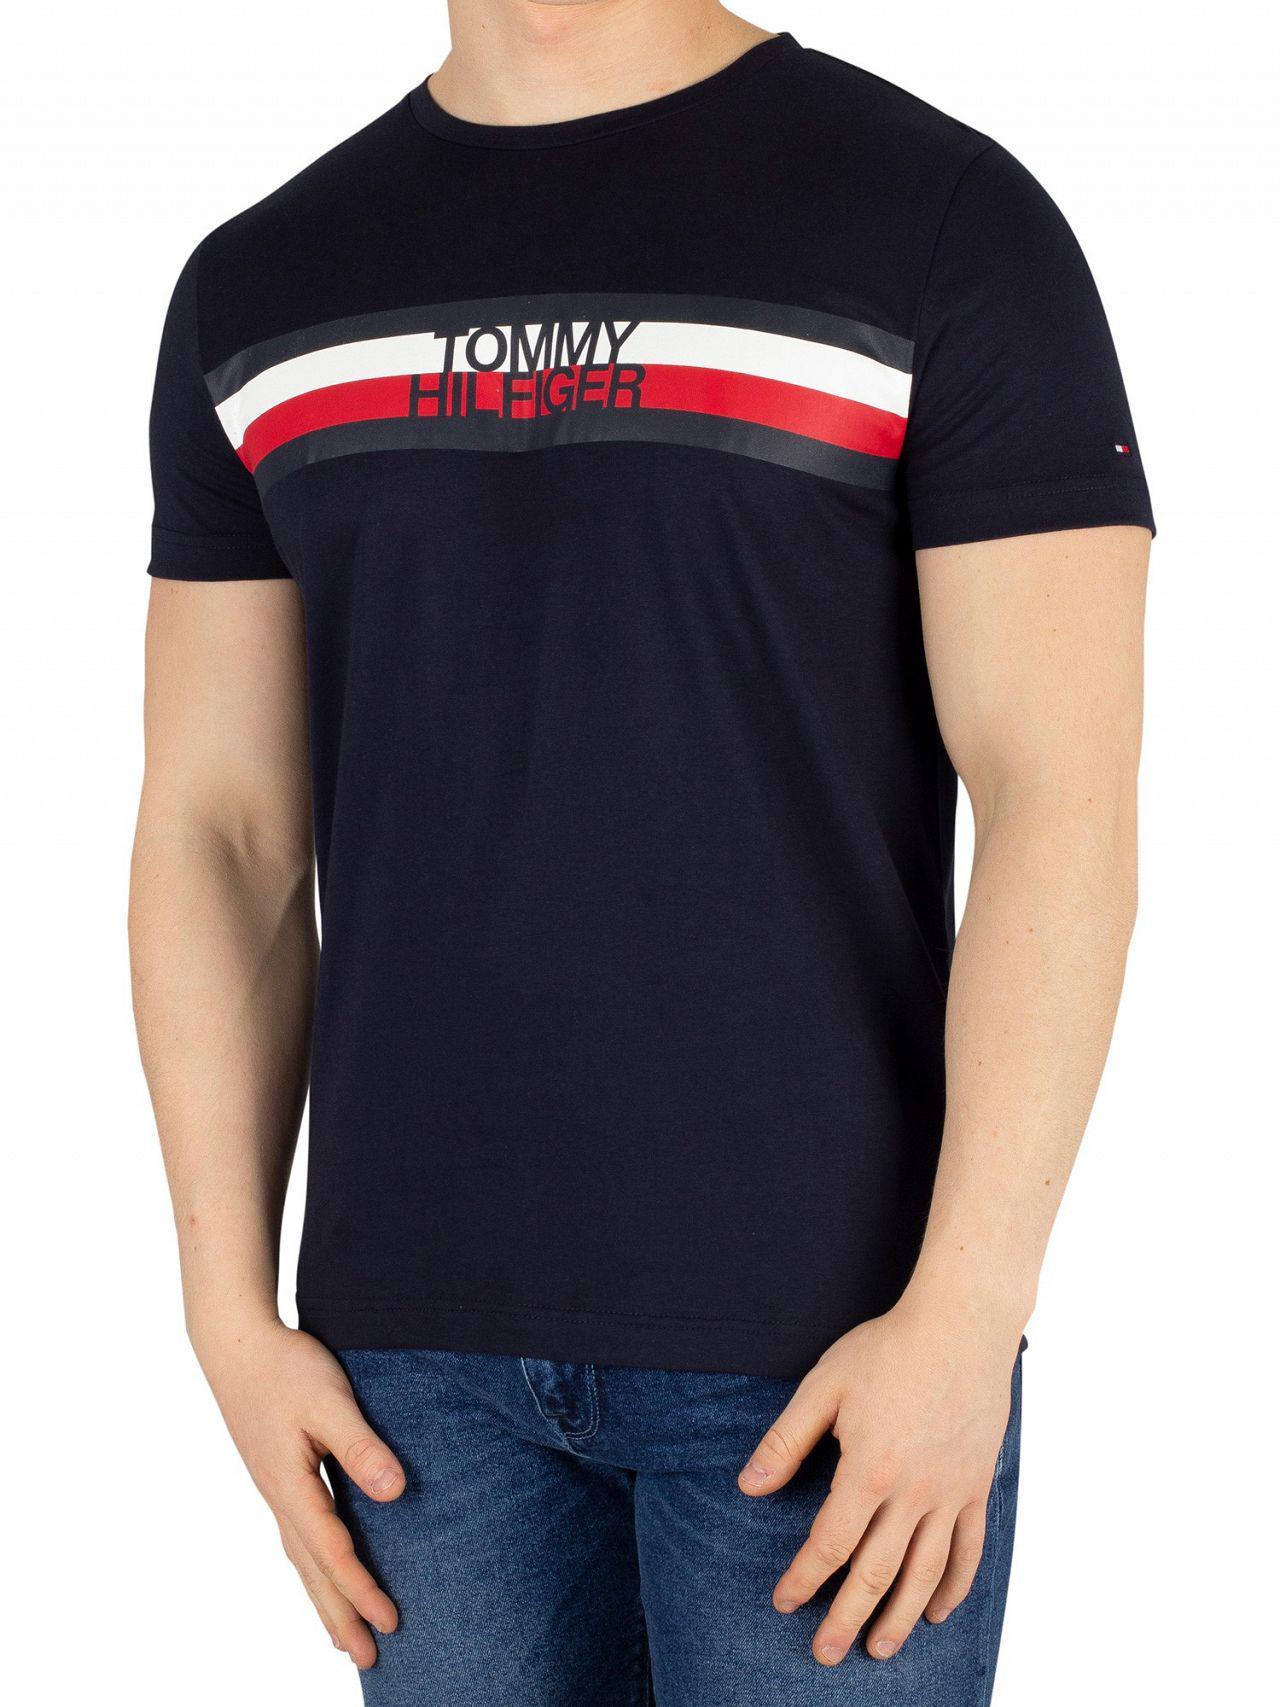 aecbd8b8 Tommy Hilfiger - Blue Sky Captain Logo T-shirt for Men - Lyst. View  fullscreen